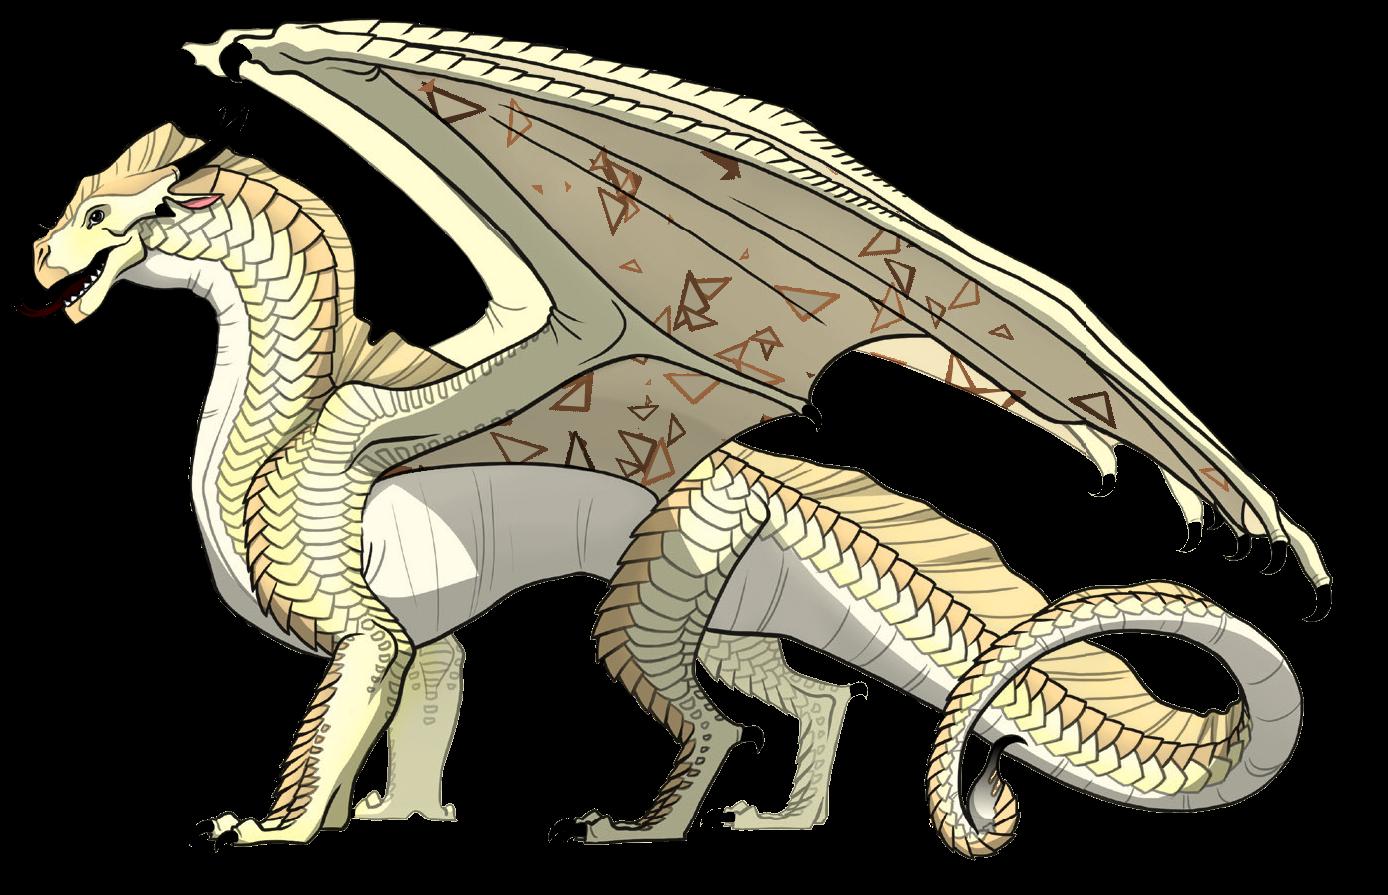 Kangaroo (Cumulus Cloud) | Wings of Fire Fanon Wiki | FANDOM powered